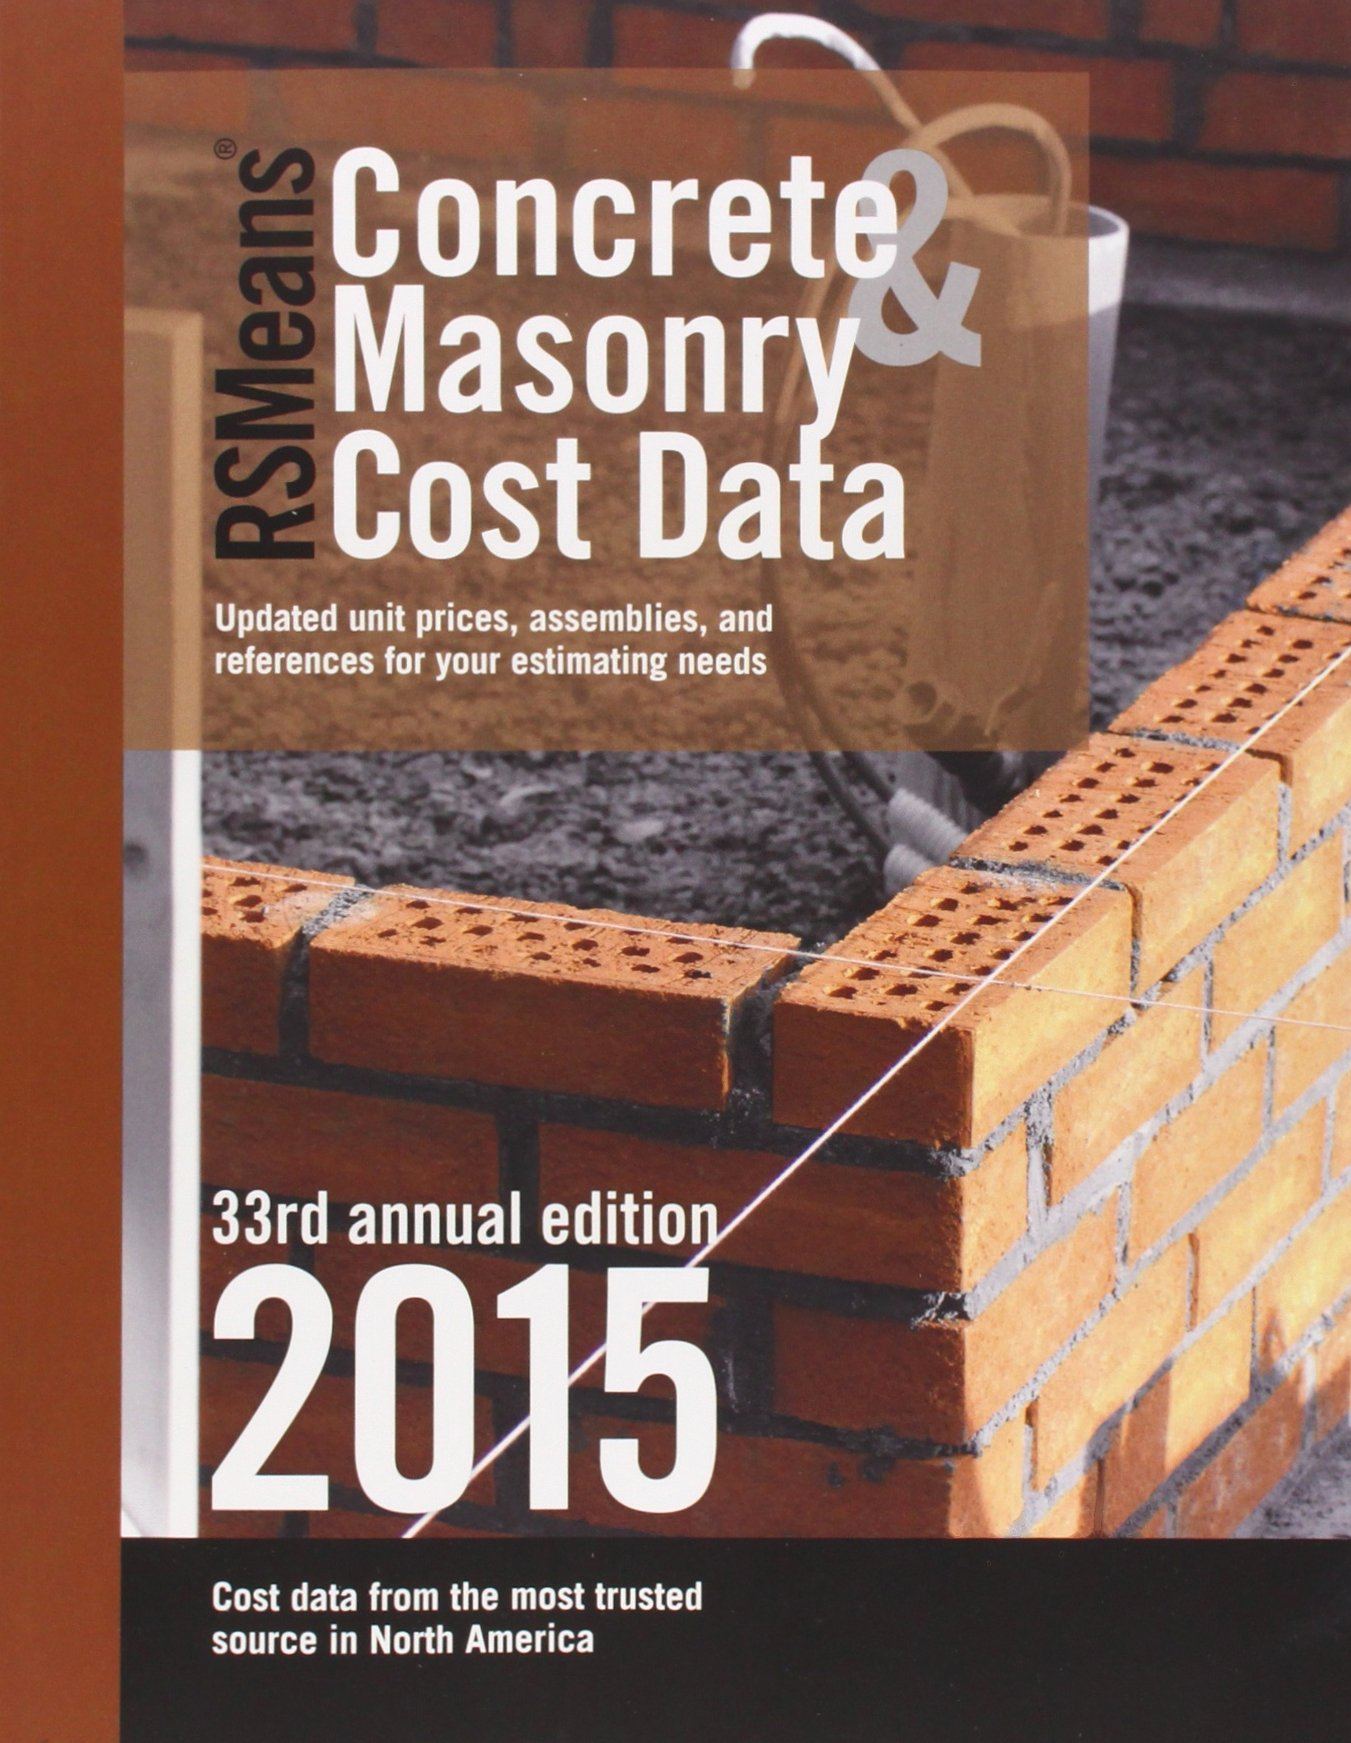 RSMeans Concrete & Masonry Cost Data 2015